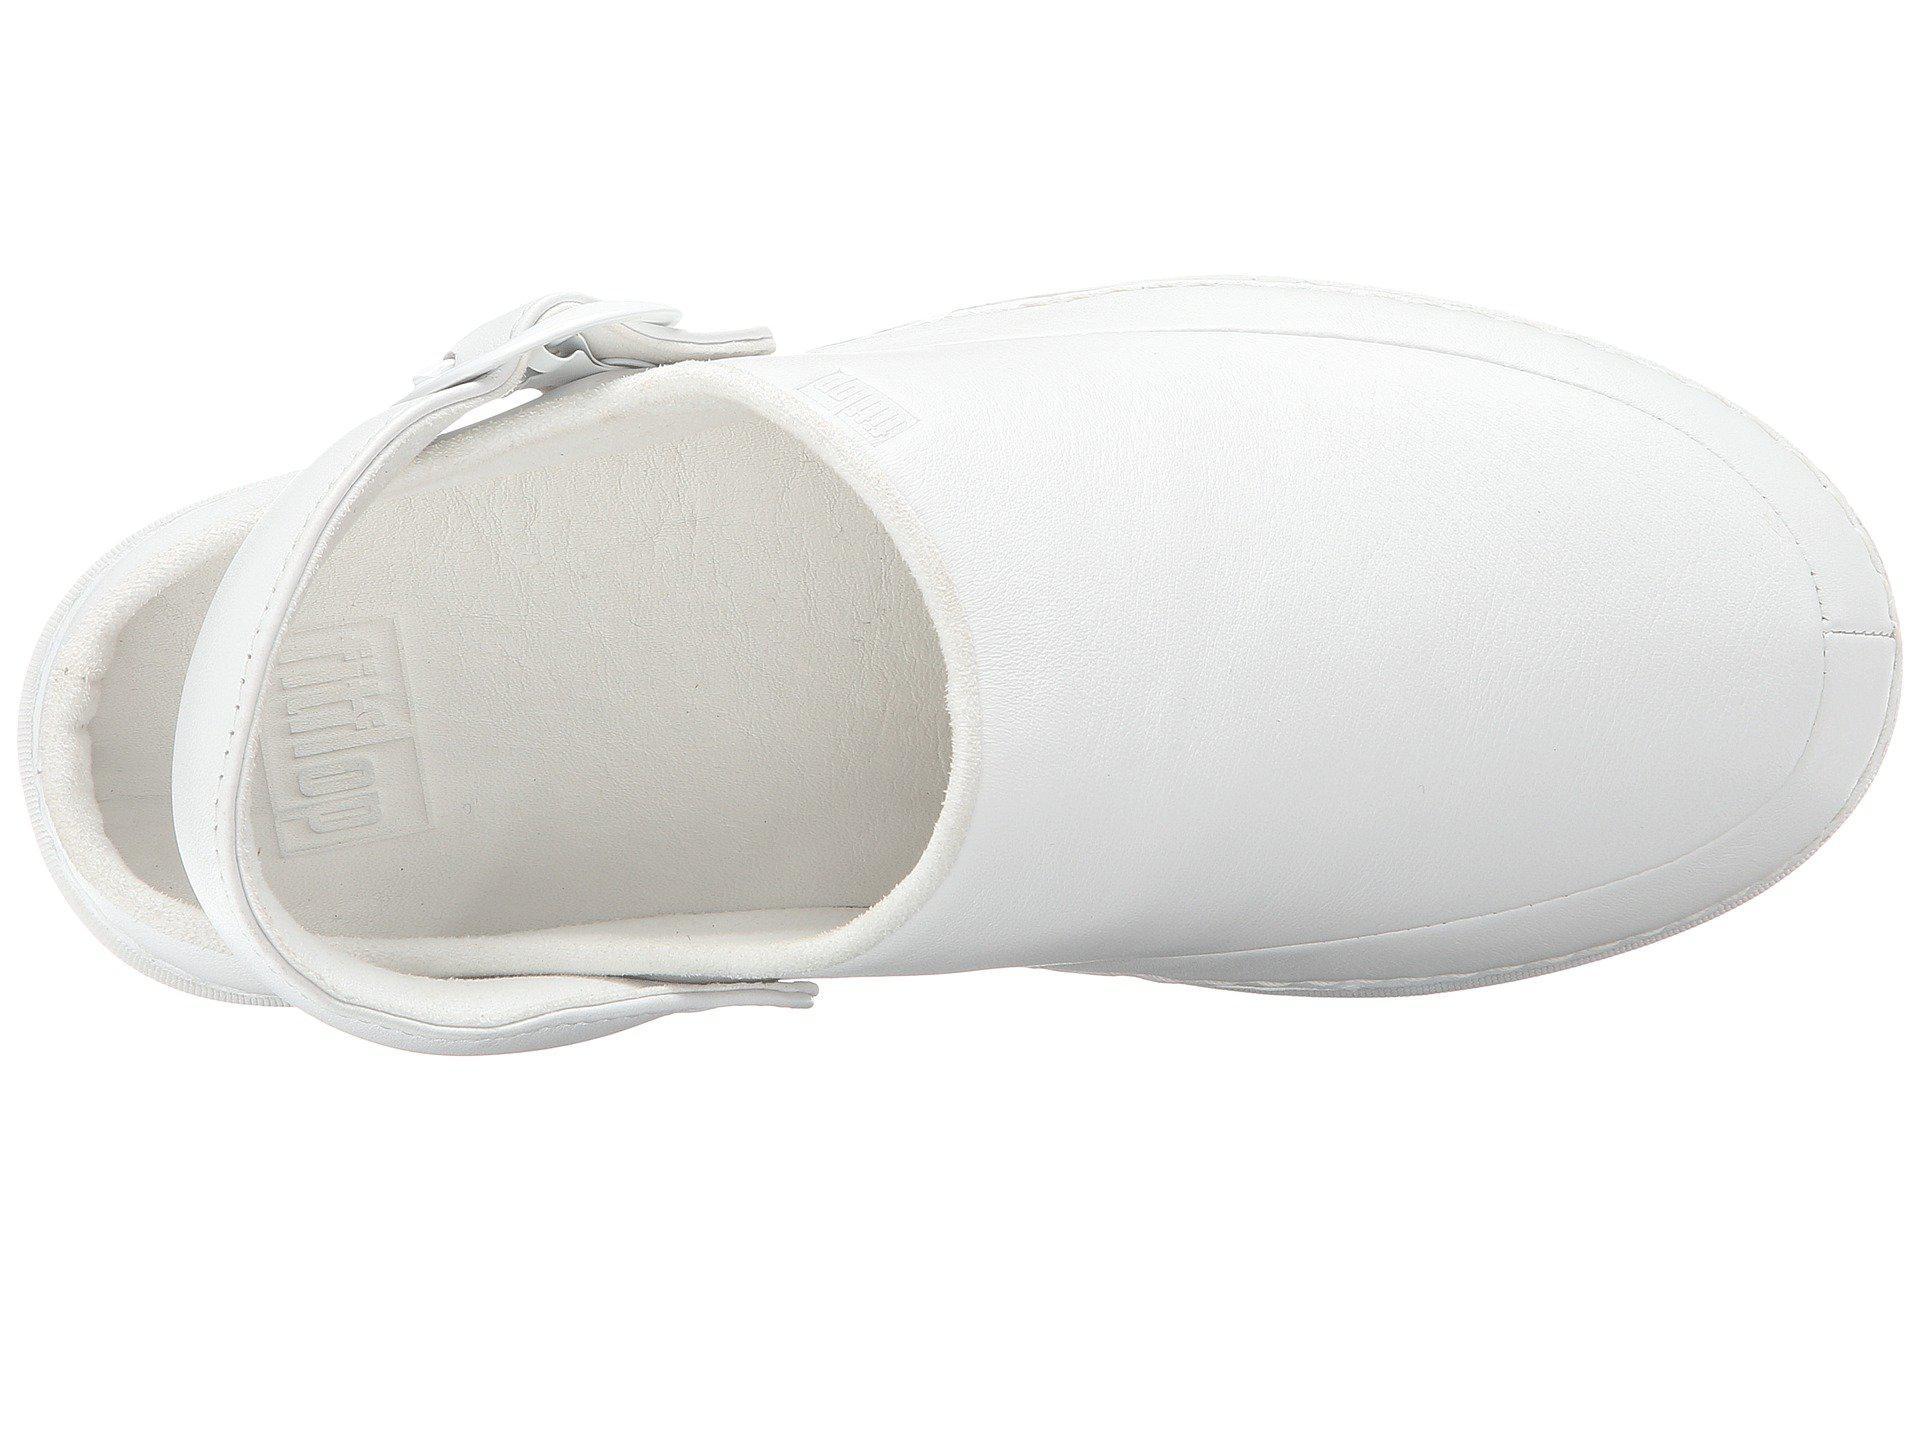 b7f570b075b4 Fitflop - Goghtm Pro Superlight (urban White) Women s Clog Shoes - Lyst.  View fullscreen